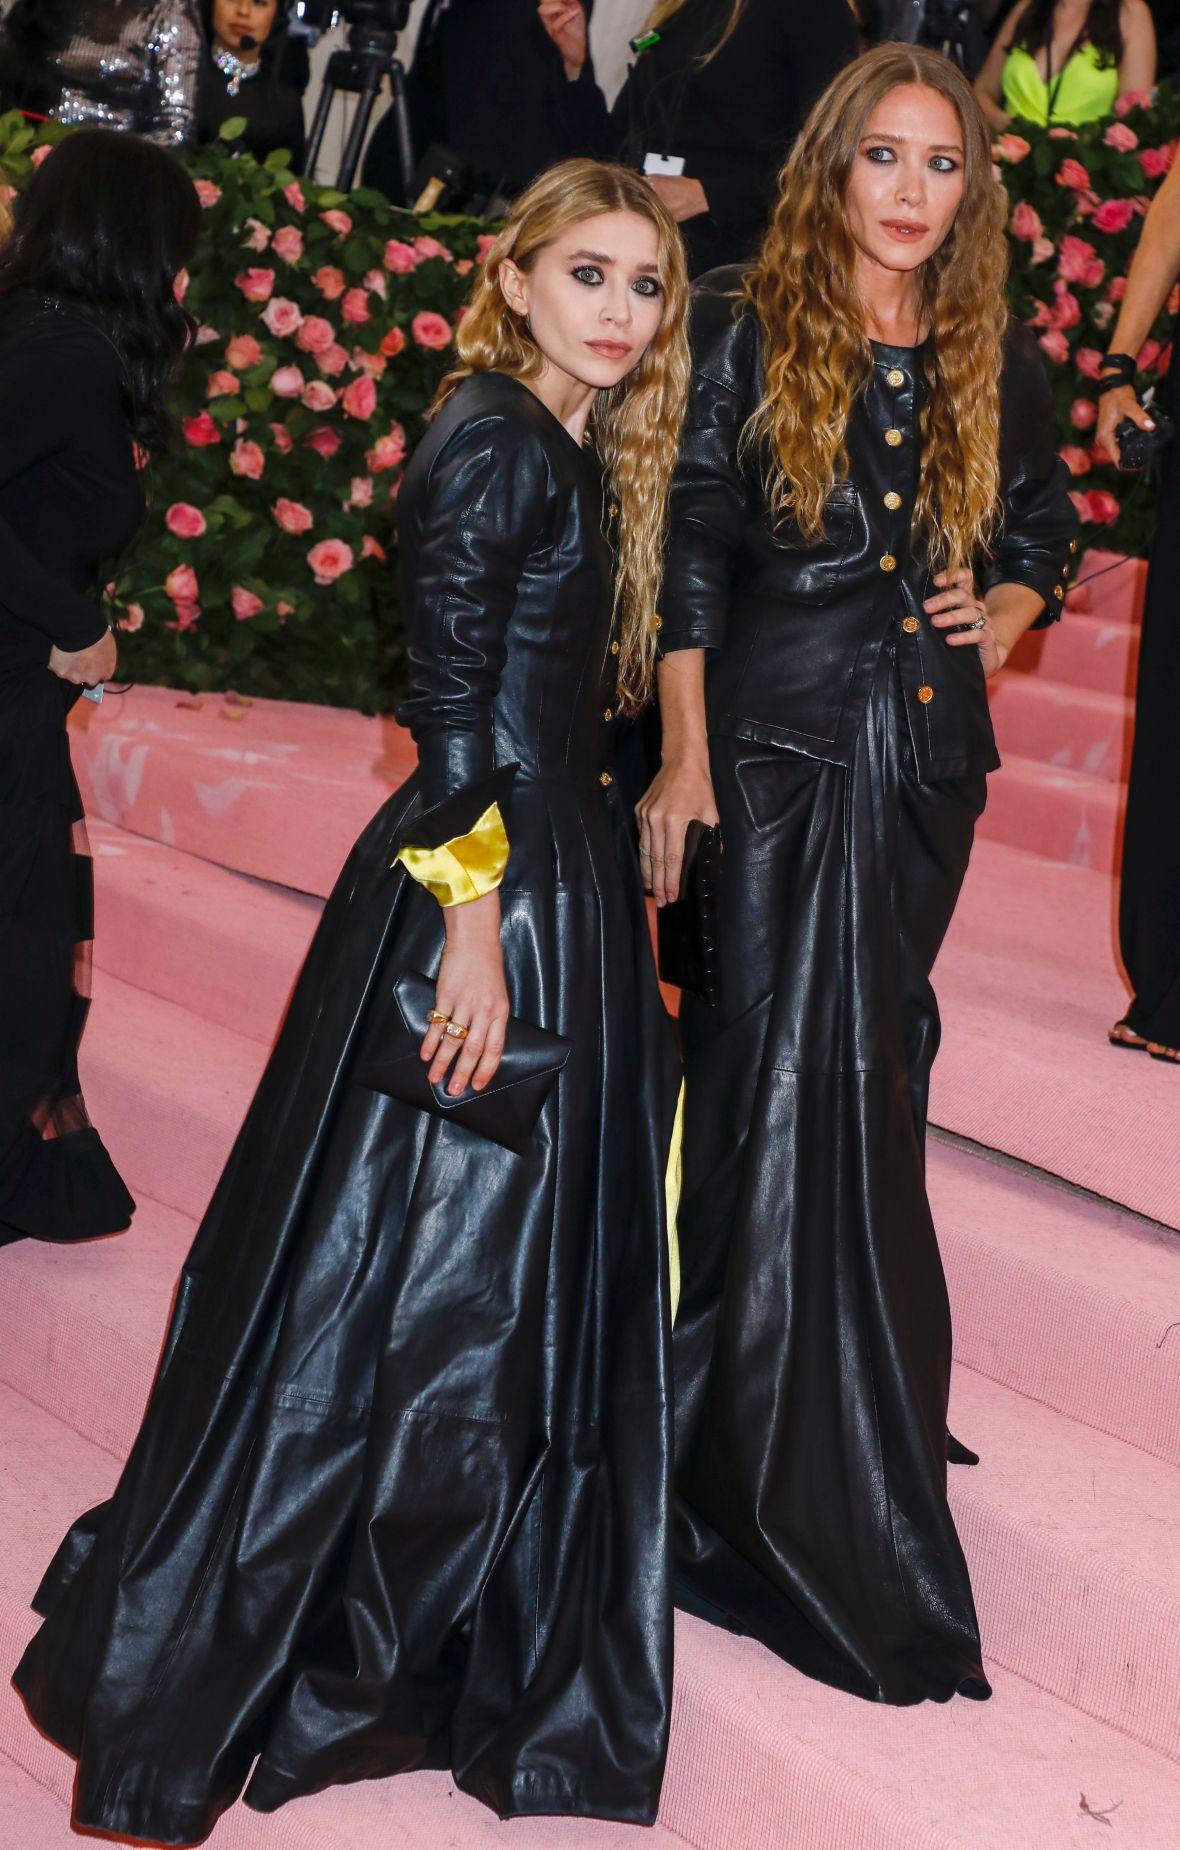 Mary-Kate Olsen and Ashley